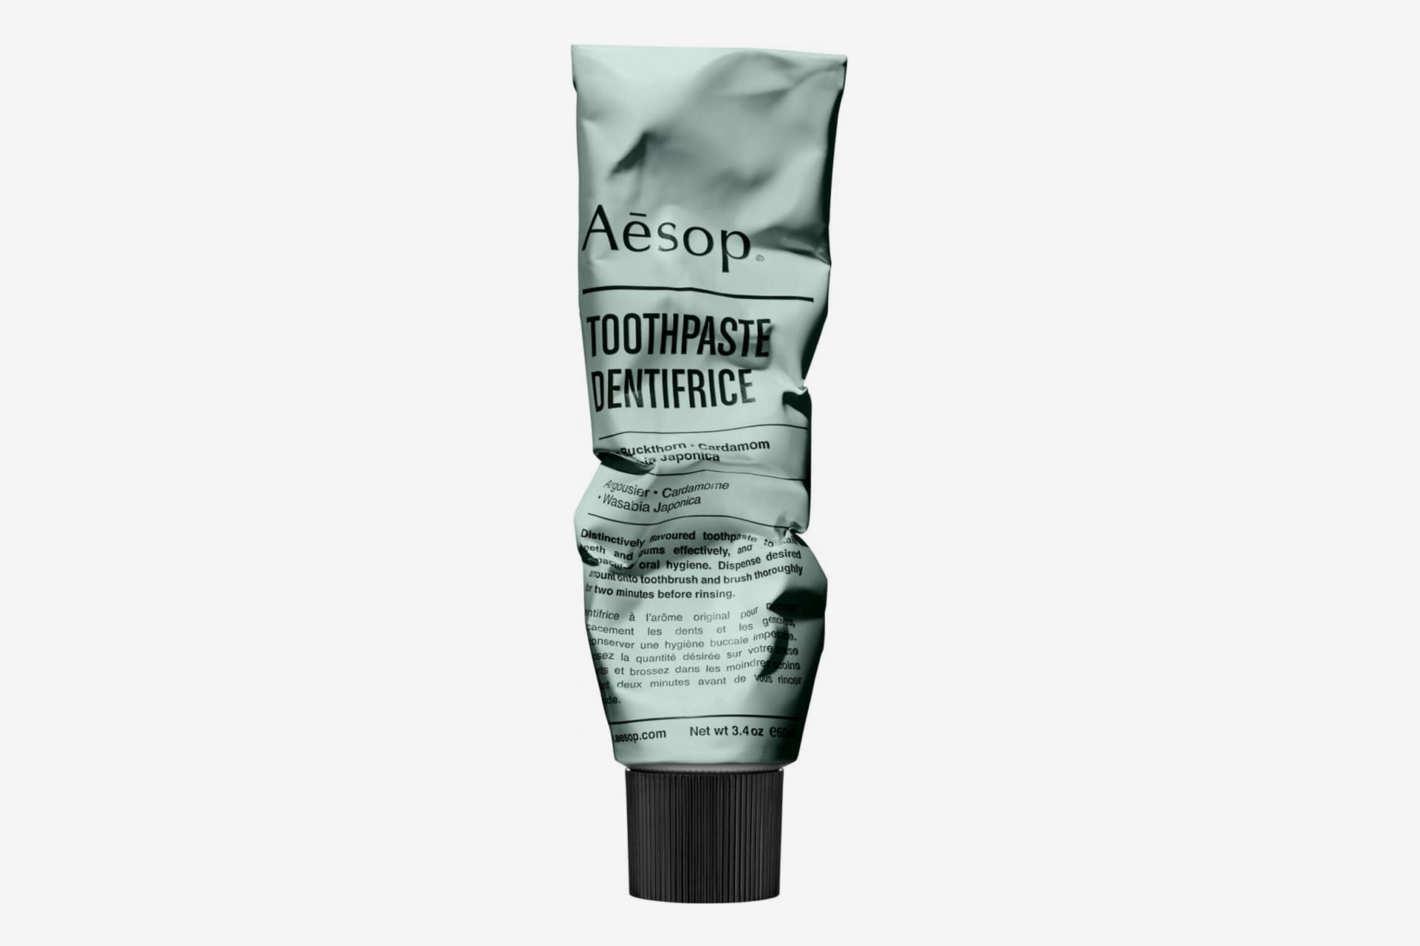 Aesop Toothpaste